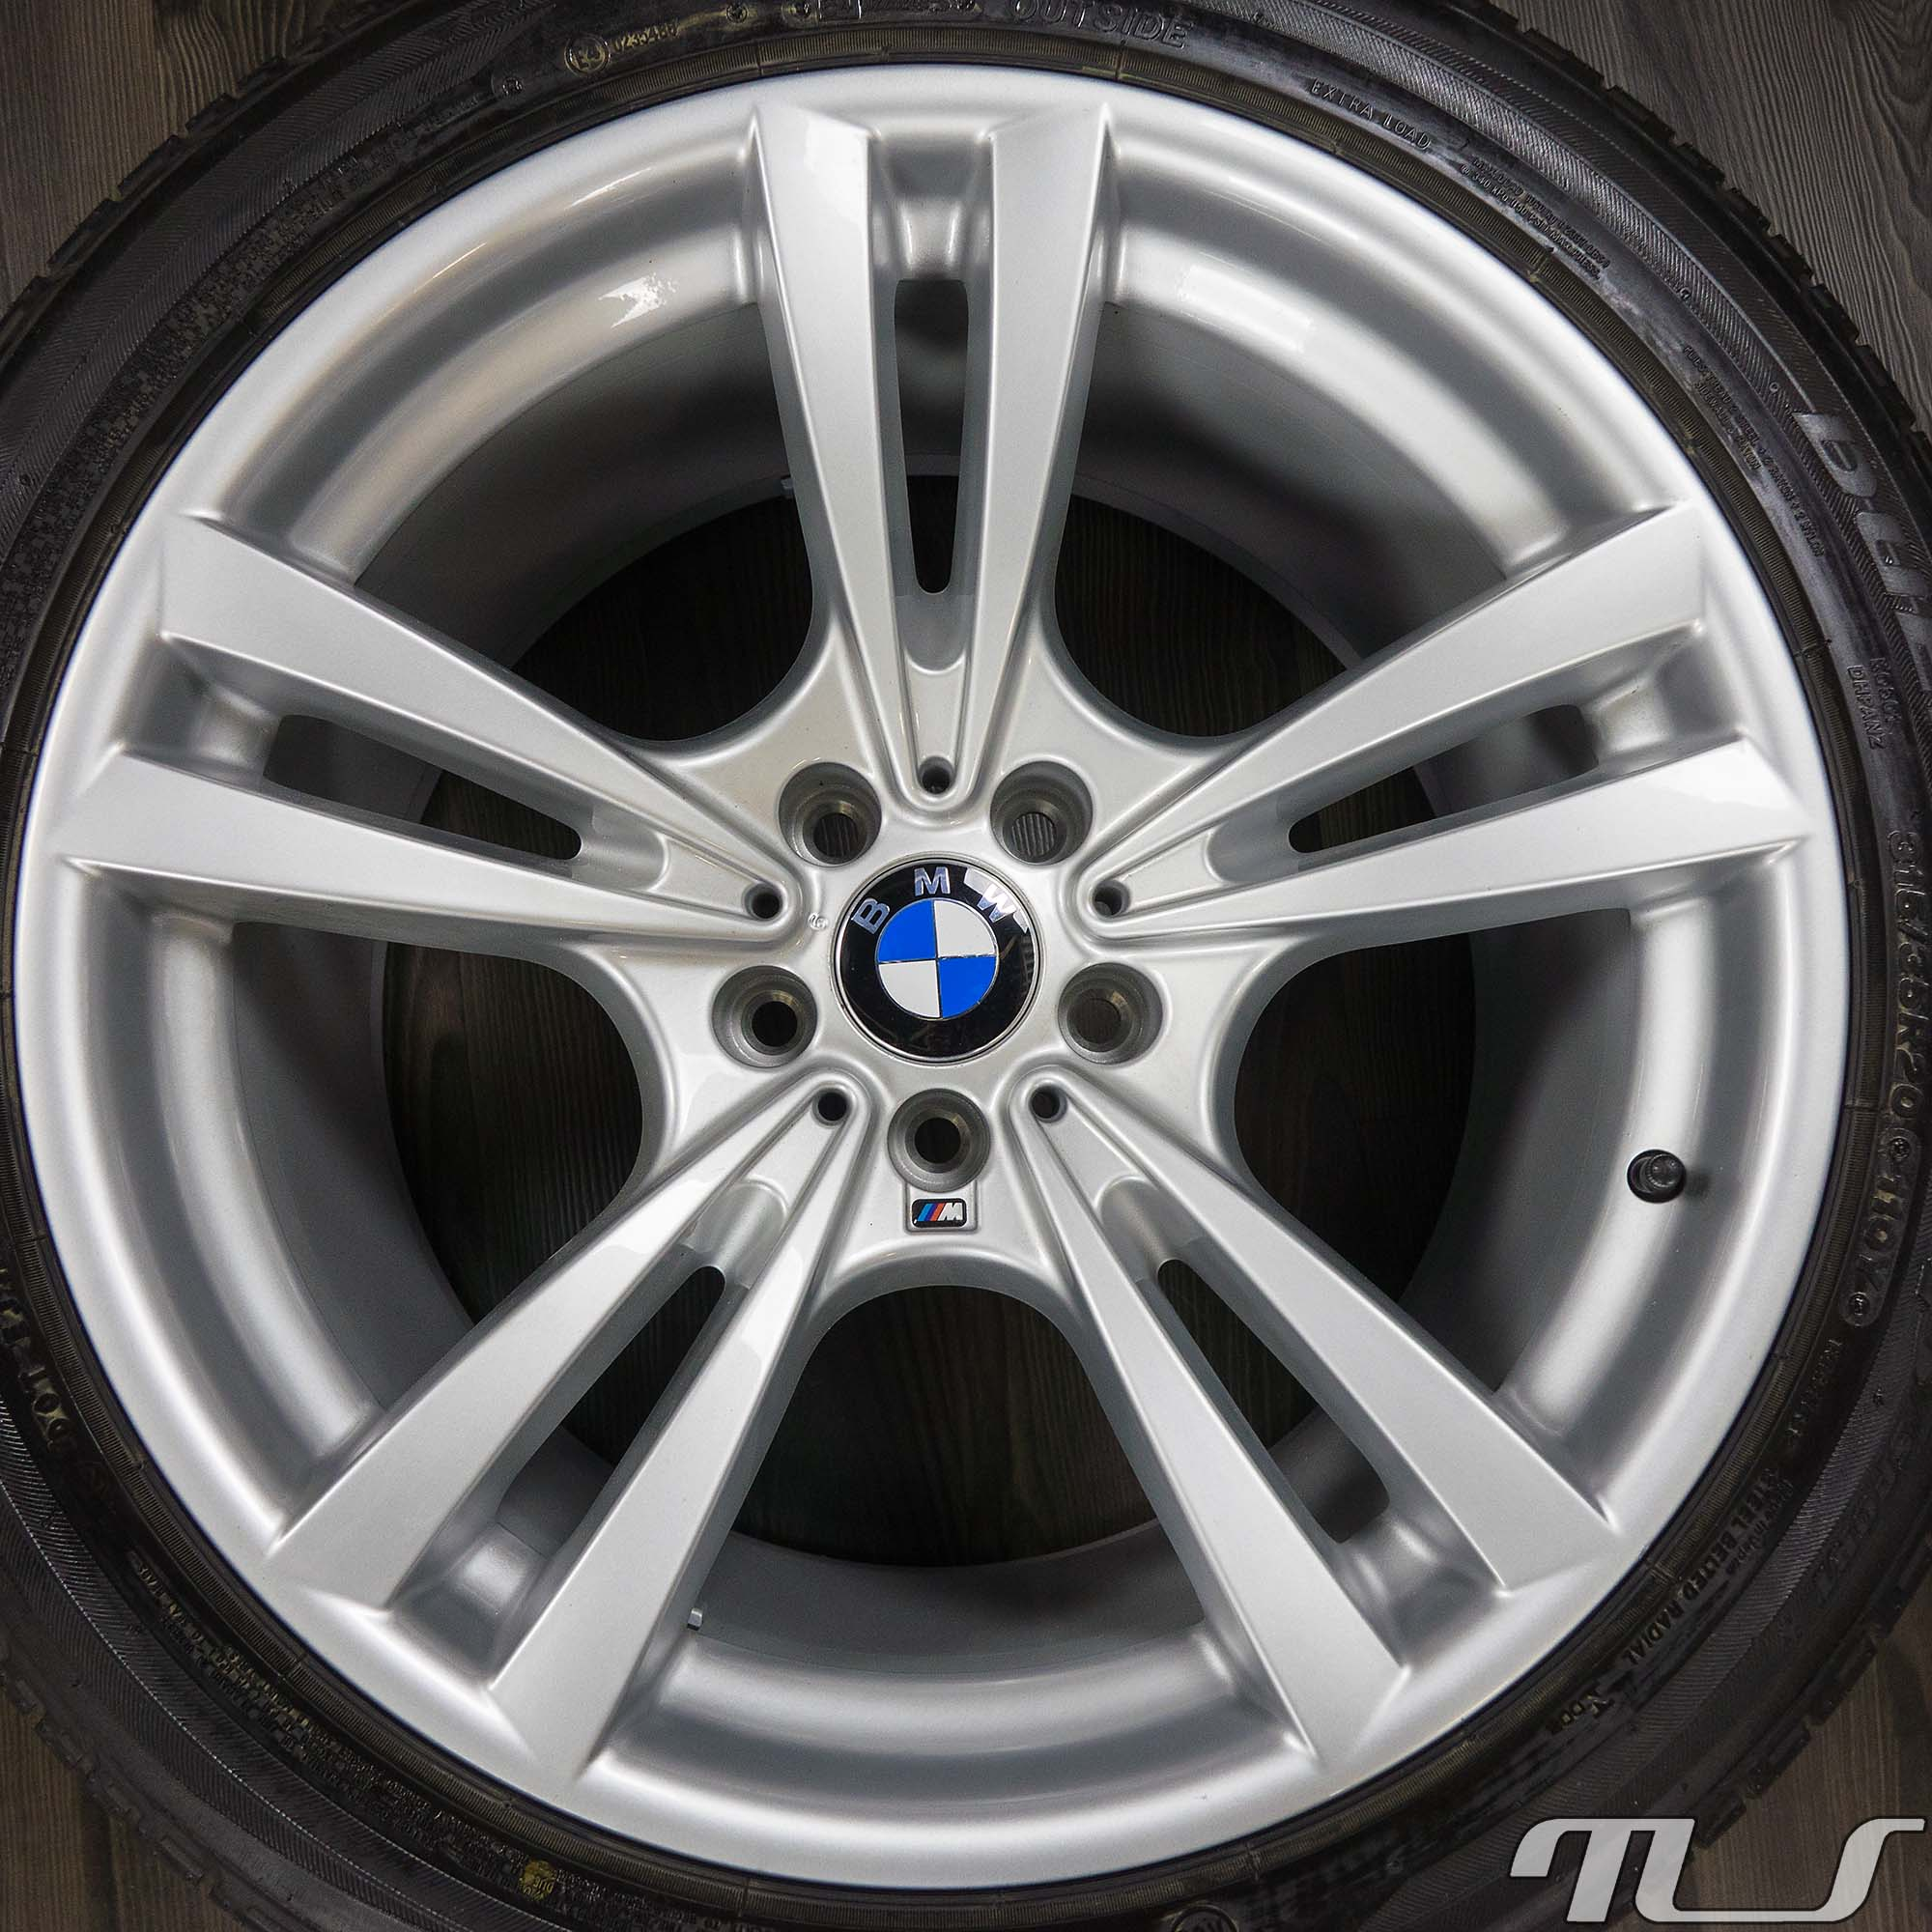 20 Inch Alloy Wheels Bmw X5 E70 X6 E71 Rims Styling M299